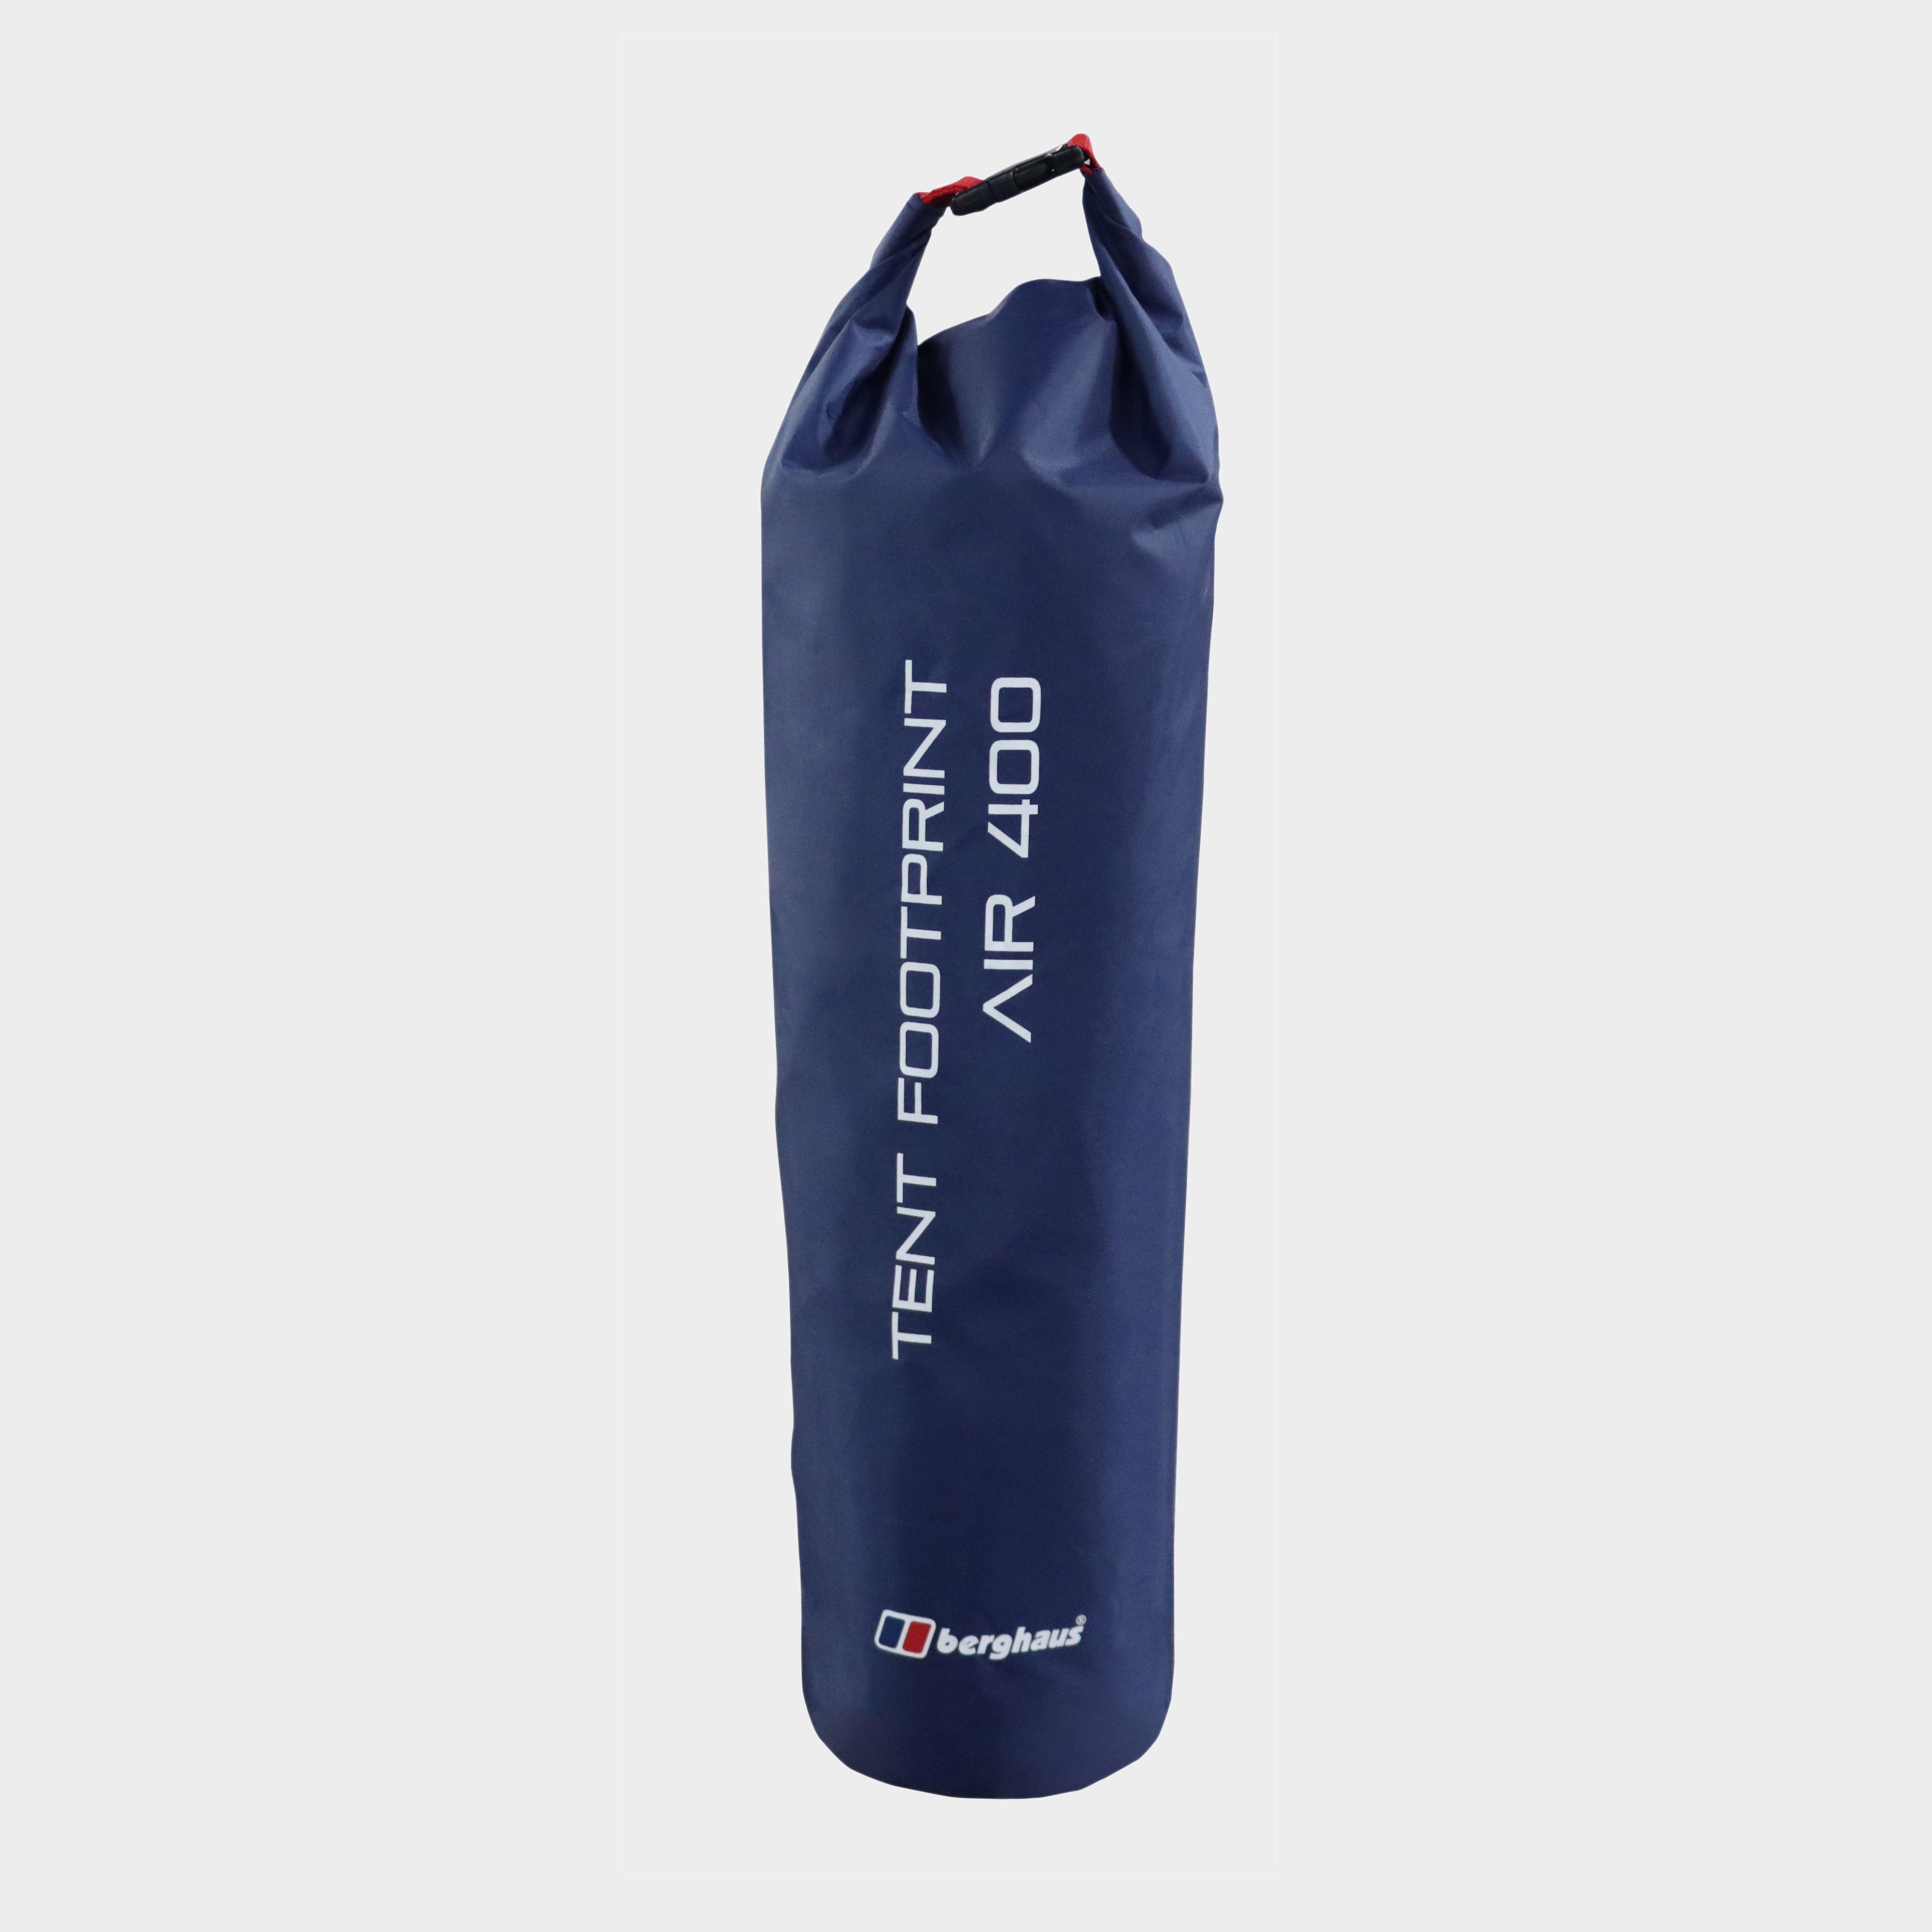 Berghaus Air 4 Tent Footprint